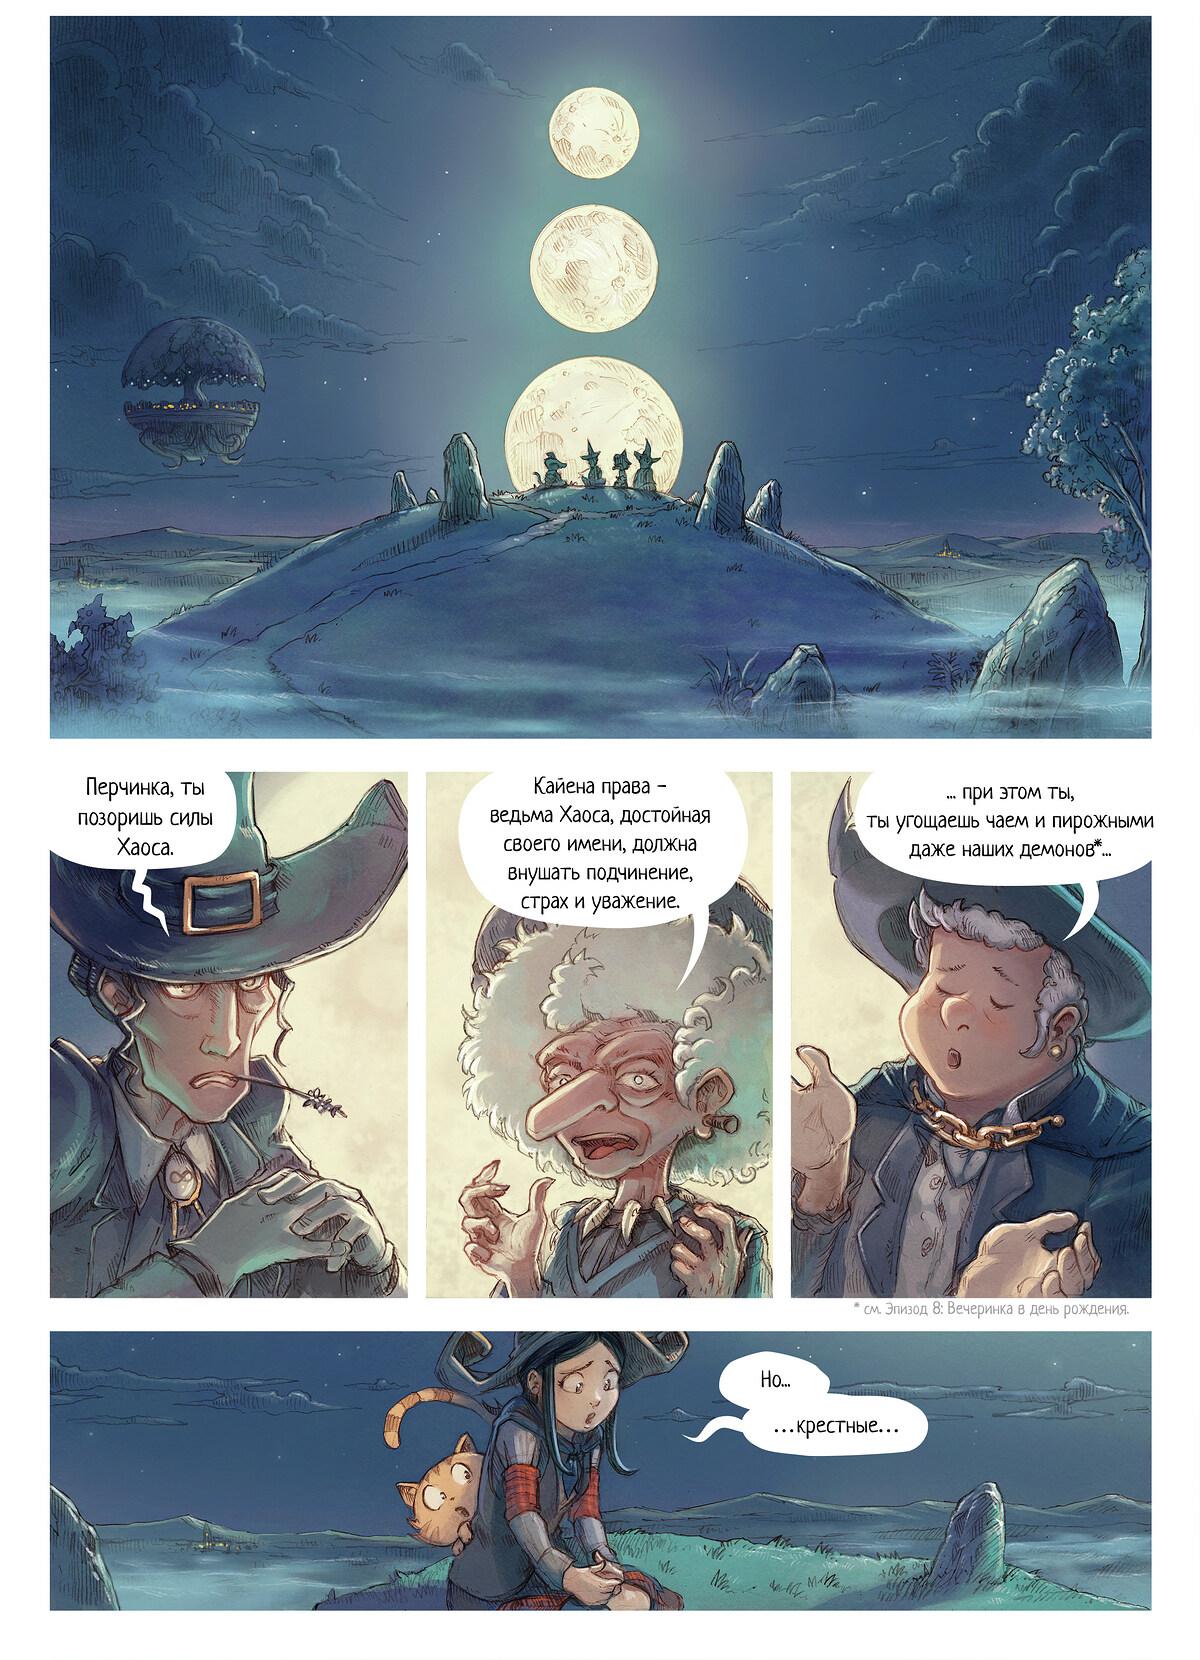 A webcomic page of Pepper&Carrot, эпизод 11 [ru], стр. 1